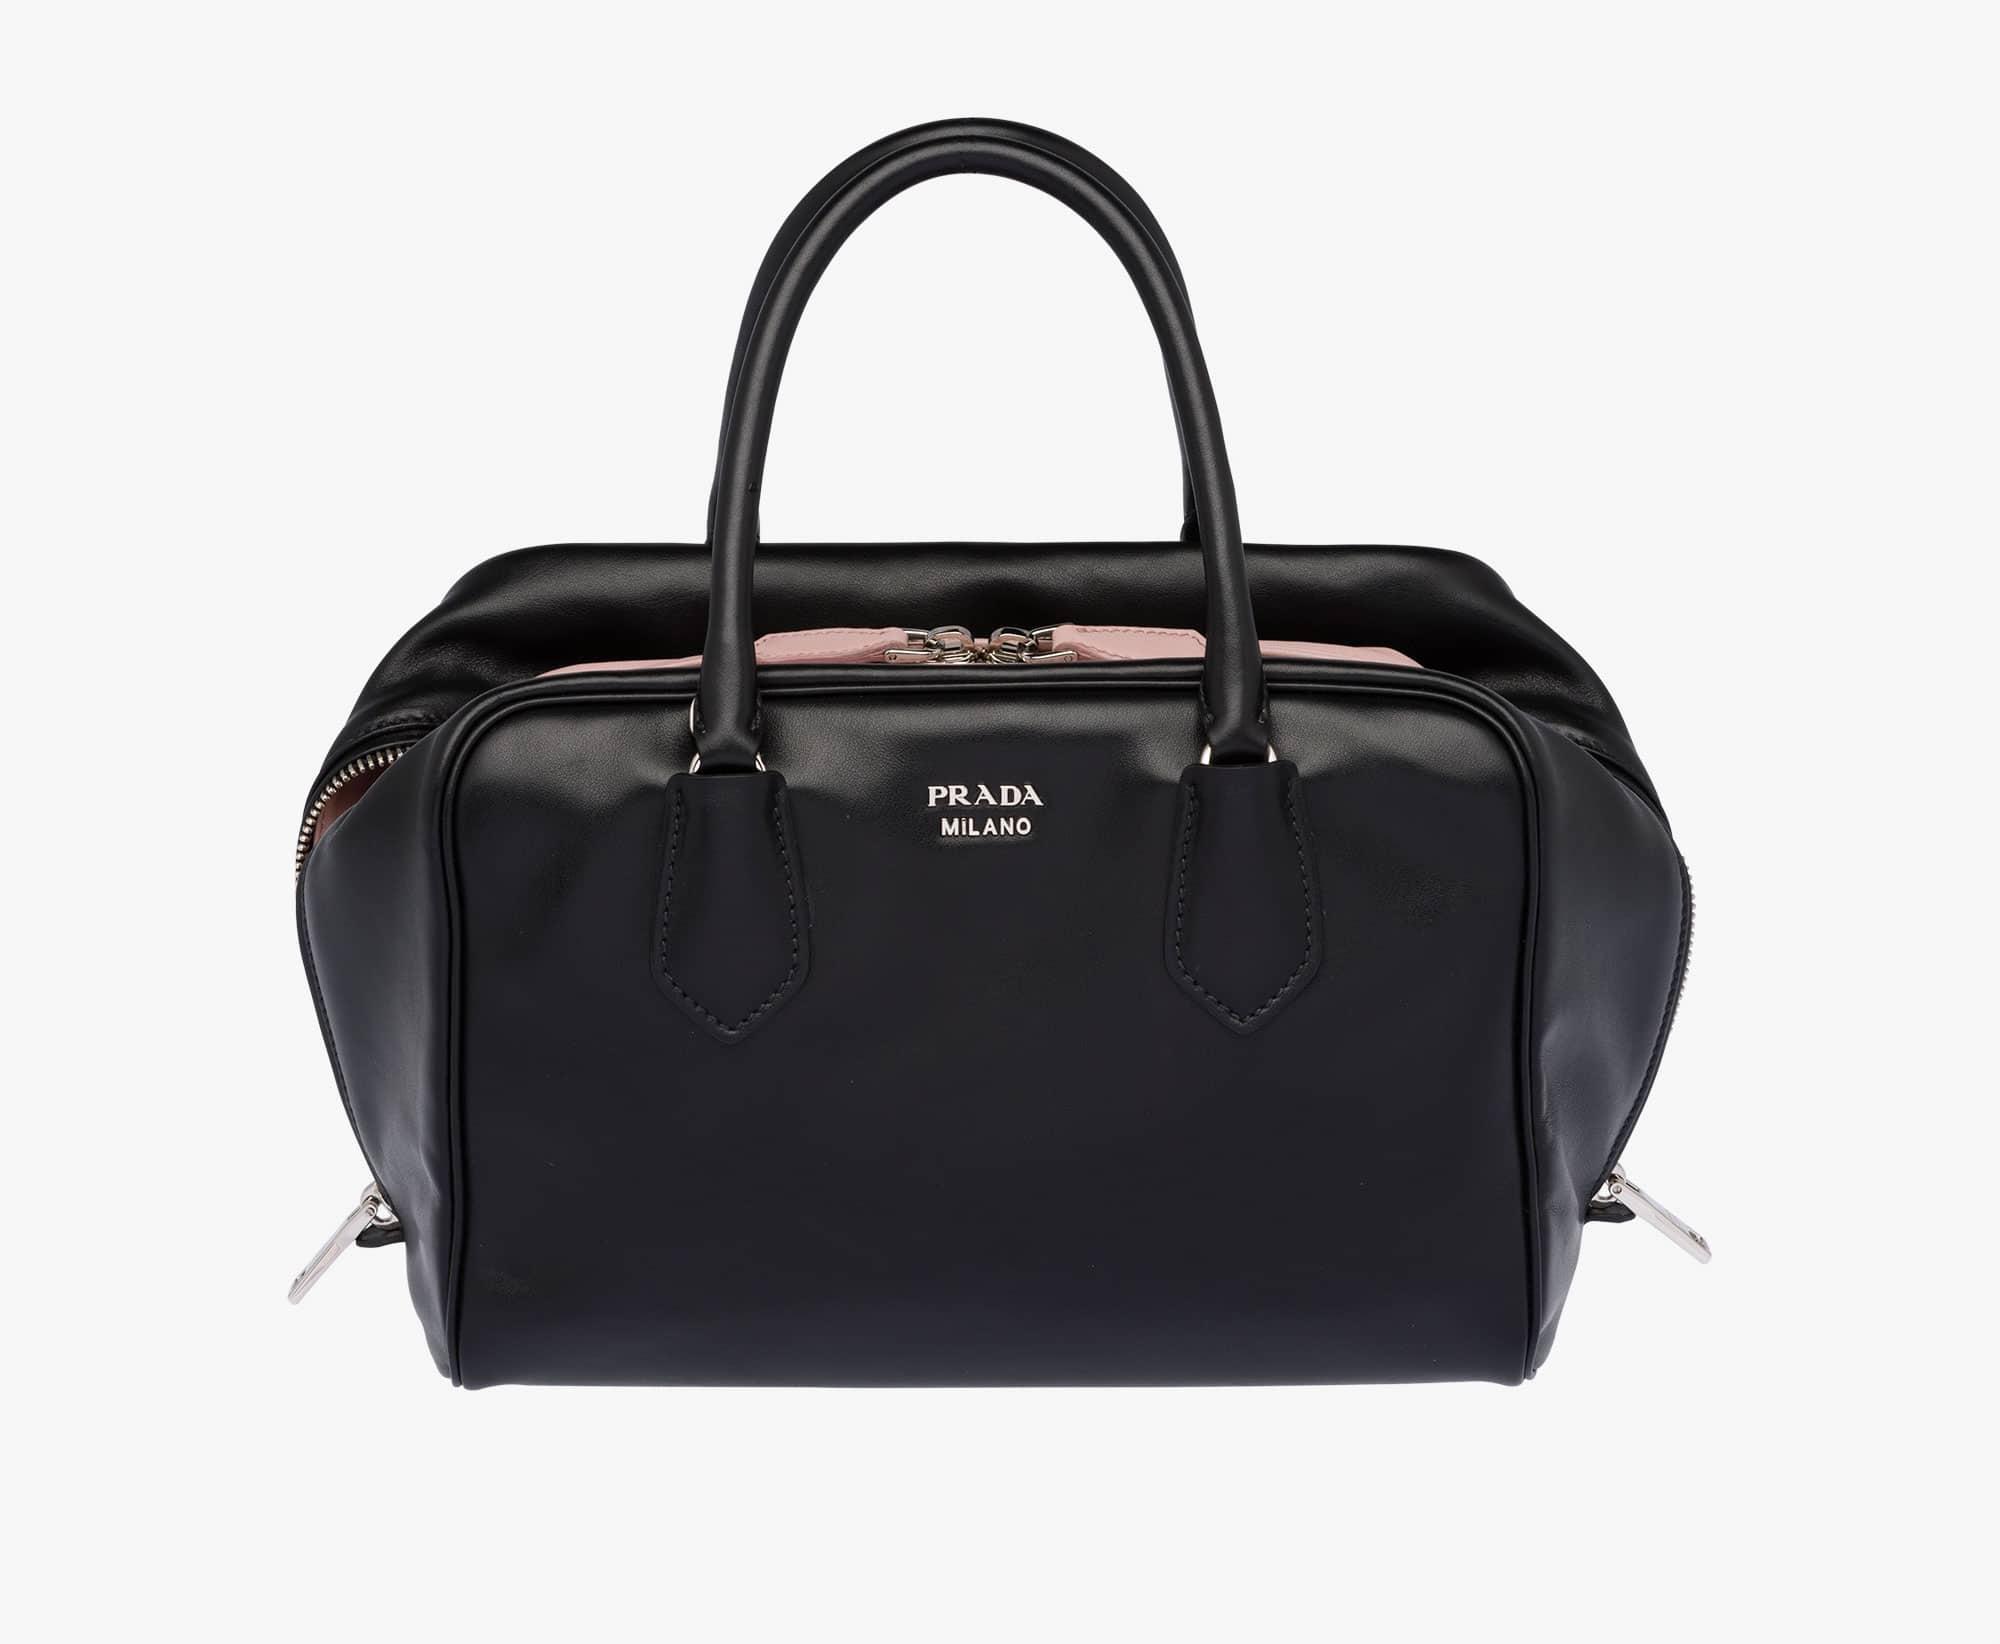 prada black canvas bag - Prada Inside Tote Bag Reference Guide   Spotted Fashion